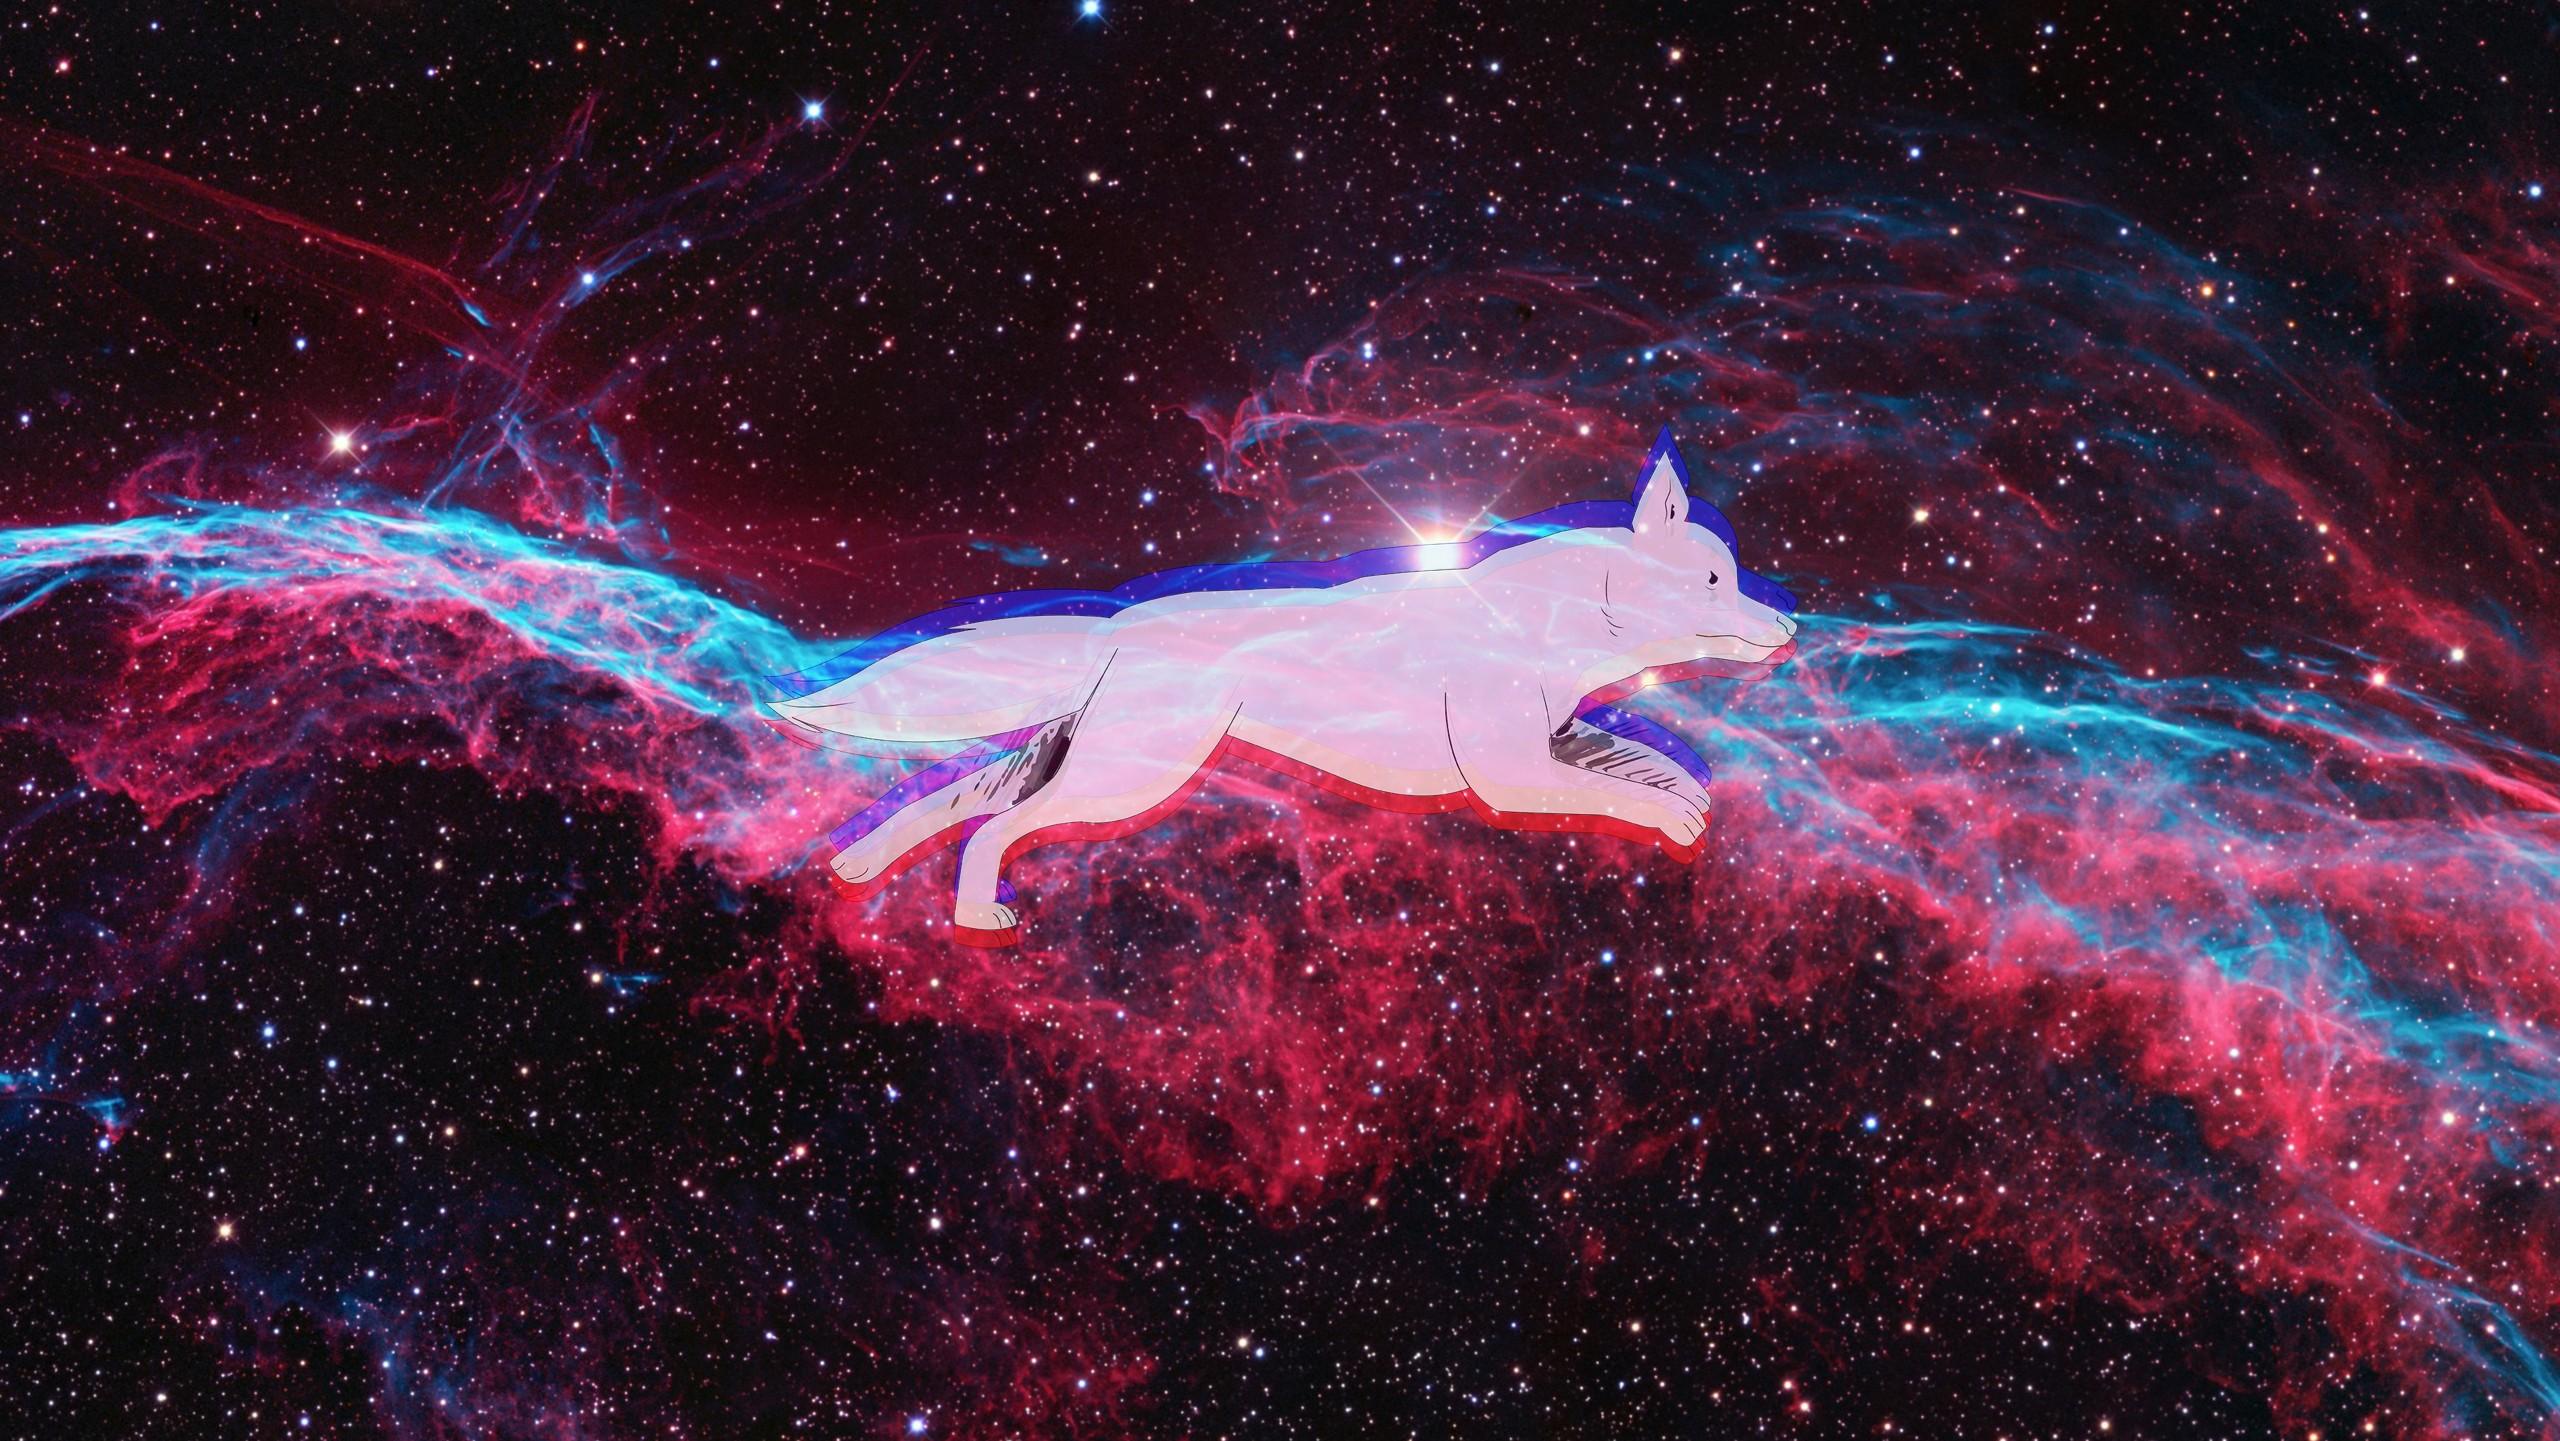 General 2560x1441 space dog space art nebula animals mammals digital art